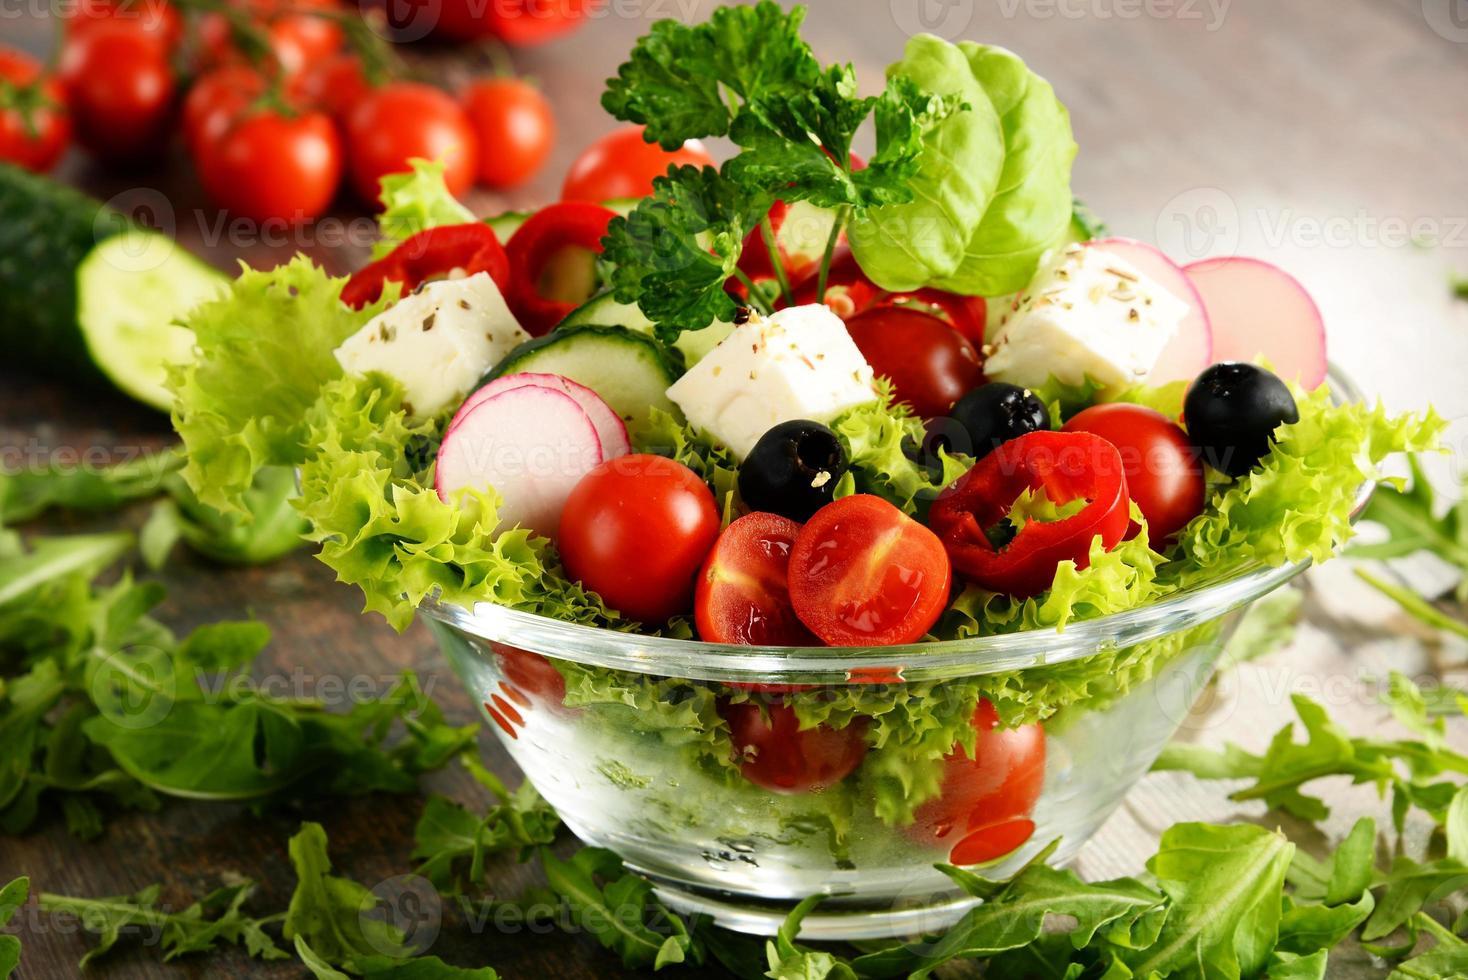 tigela de salada de legumes na mesa da cozinha. dieta balanceada foto